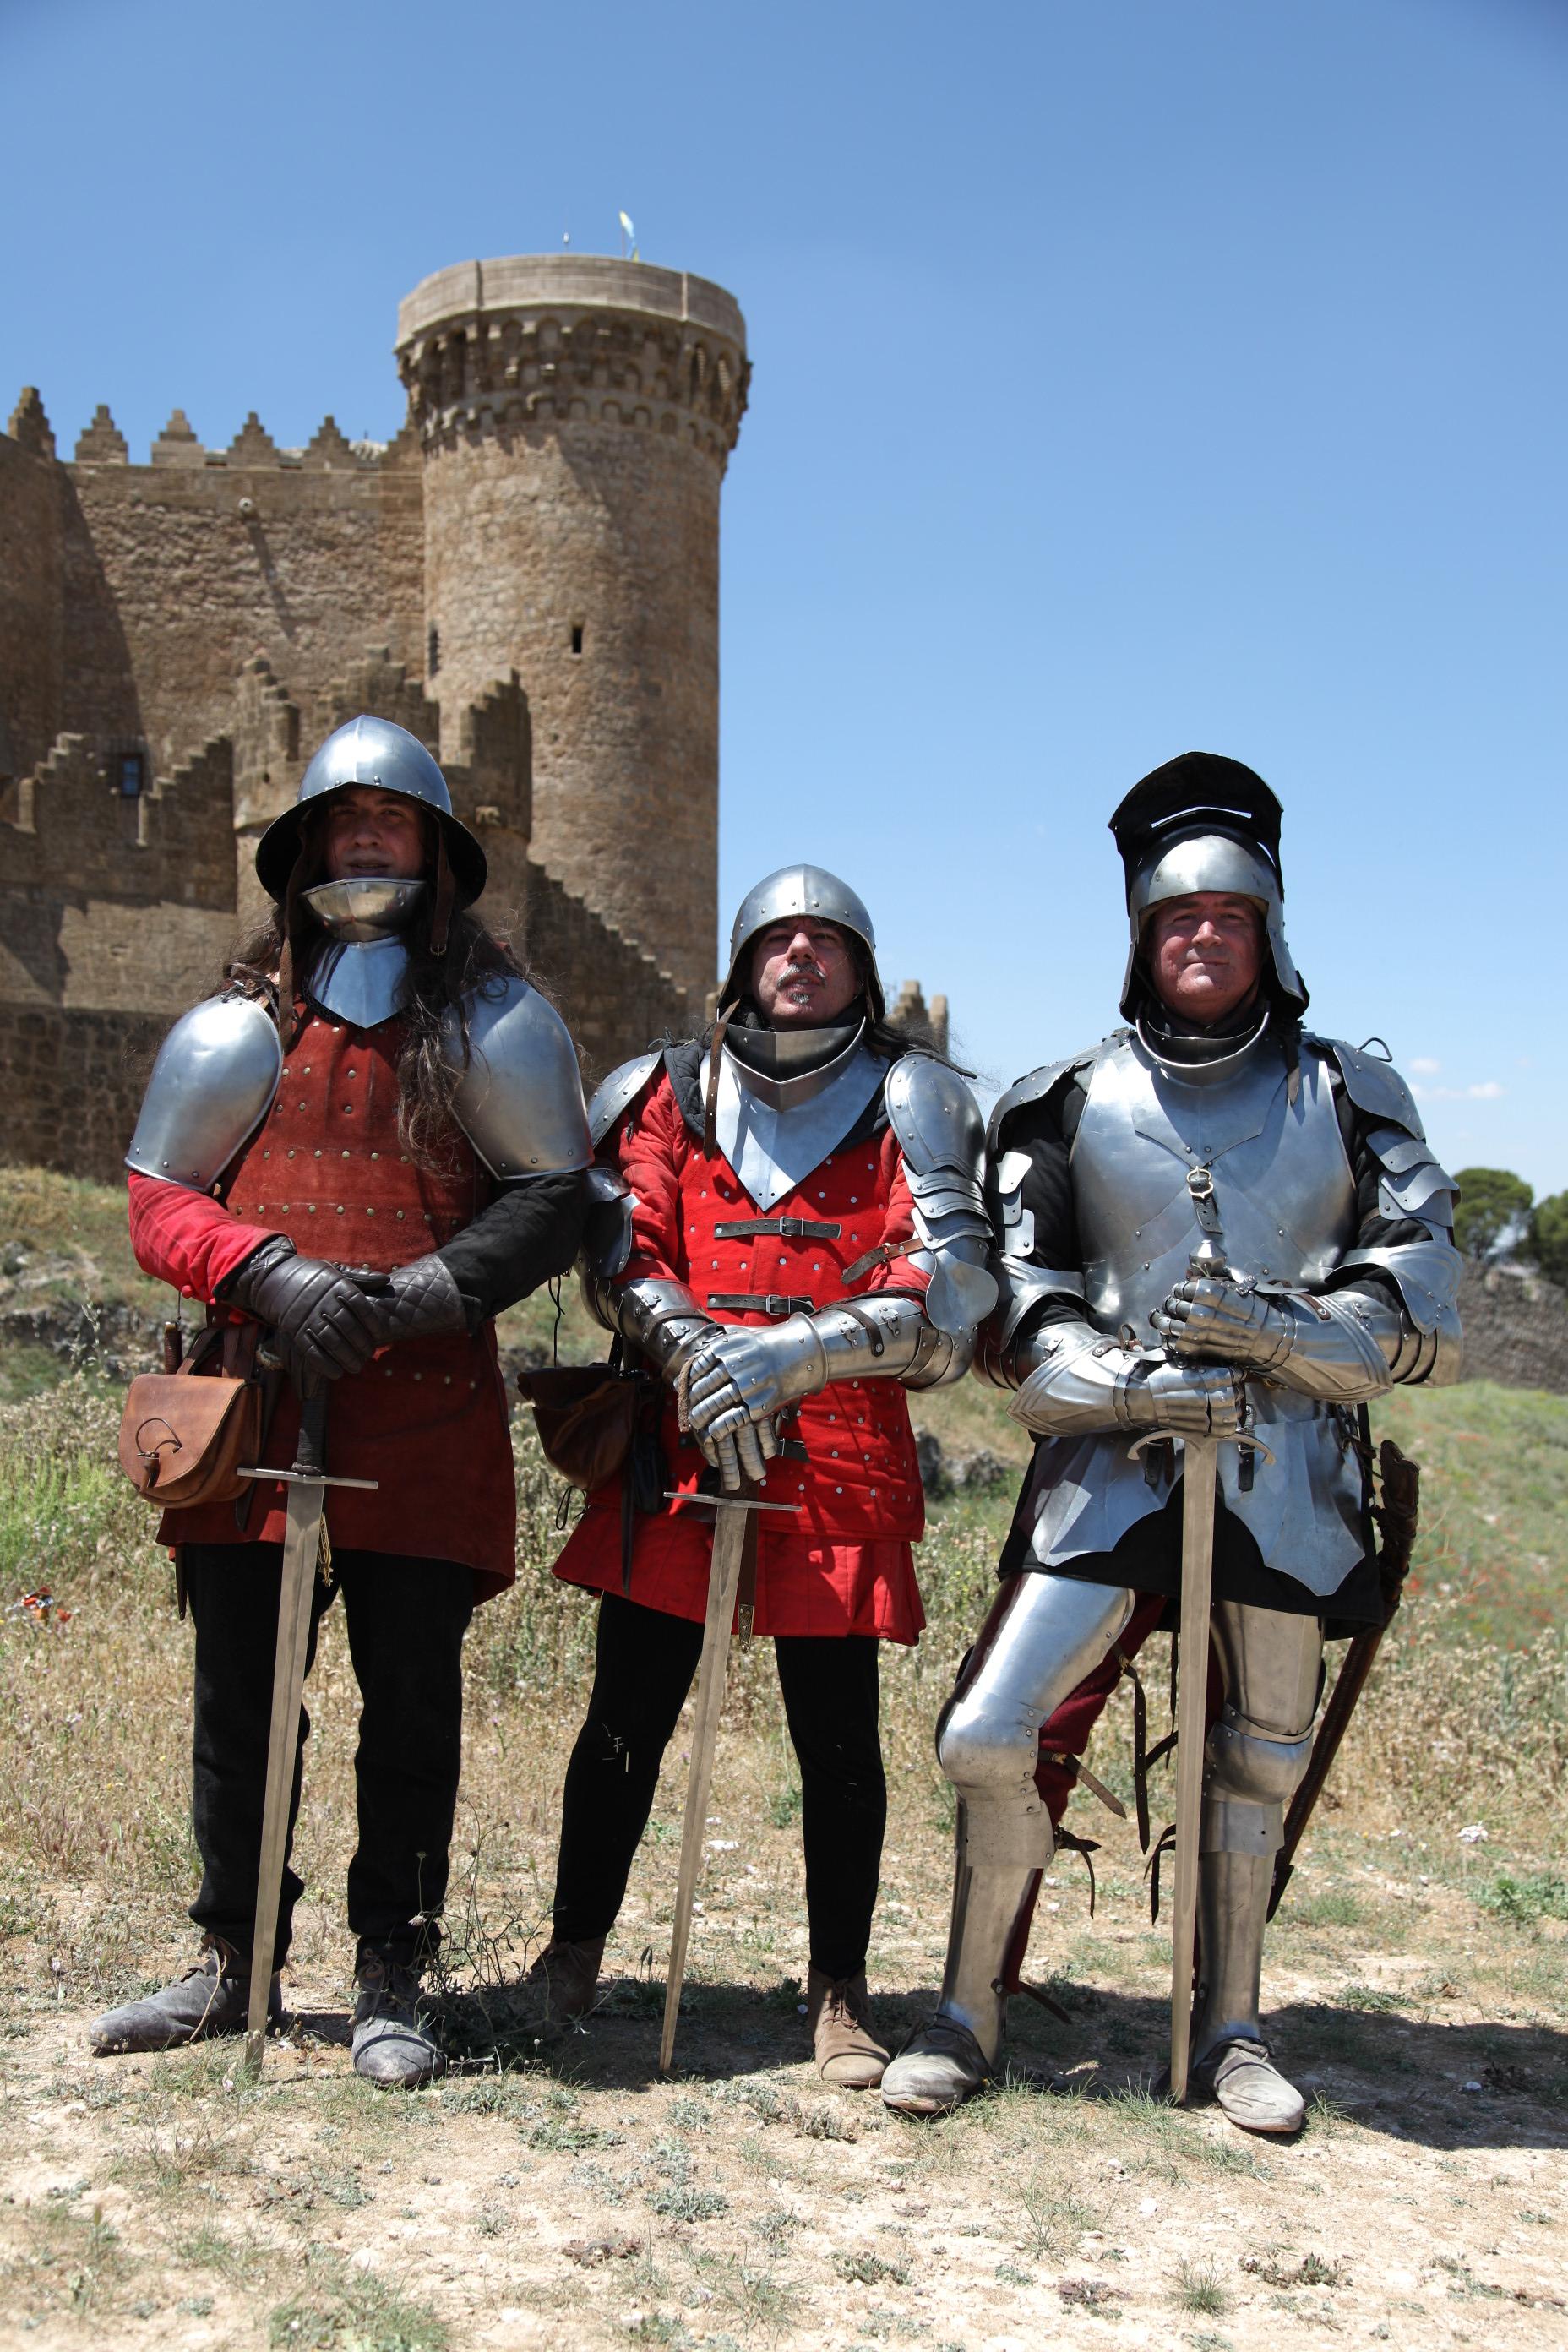 V Jornadas de Recreación Histórica con la Guerra de Sucesión Castellana (1475) Castillo de Belmonte TorllP